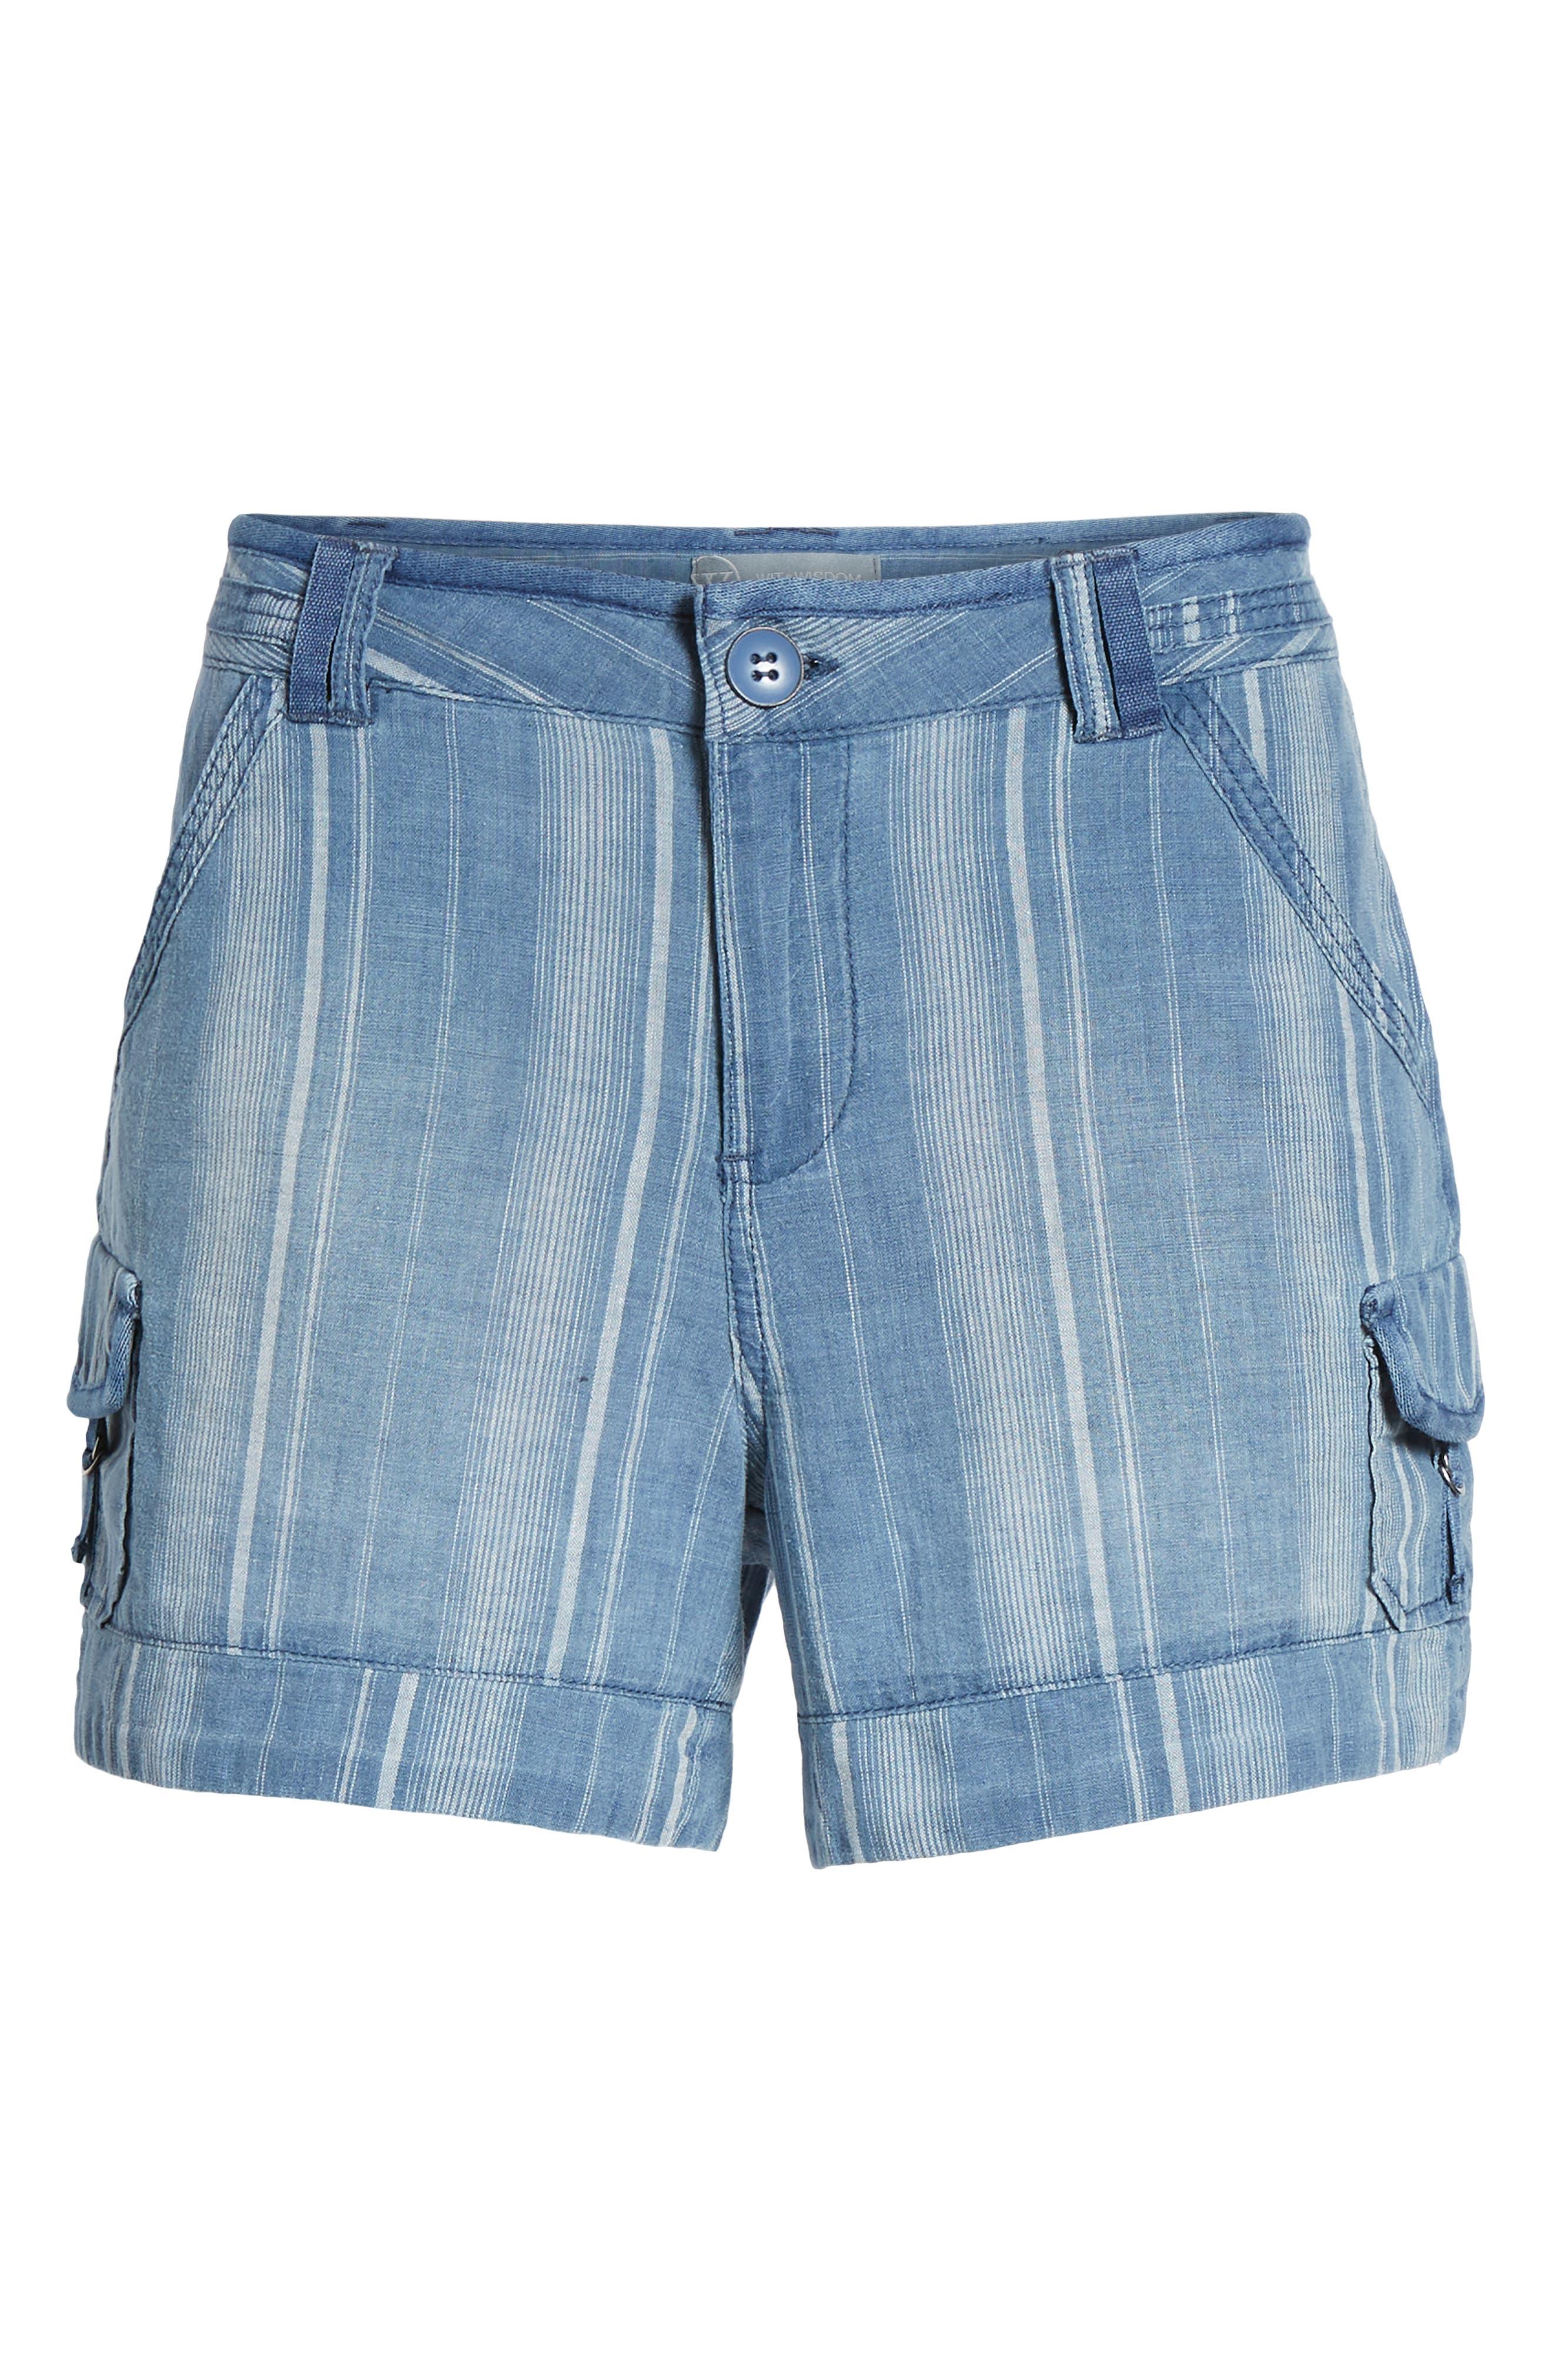 High Rise Striped Shorts,                             Alternate thumbnail 6, color,                             Blue Stripe